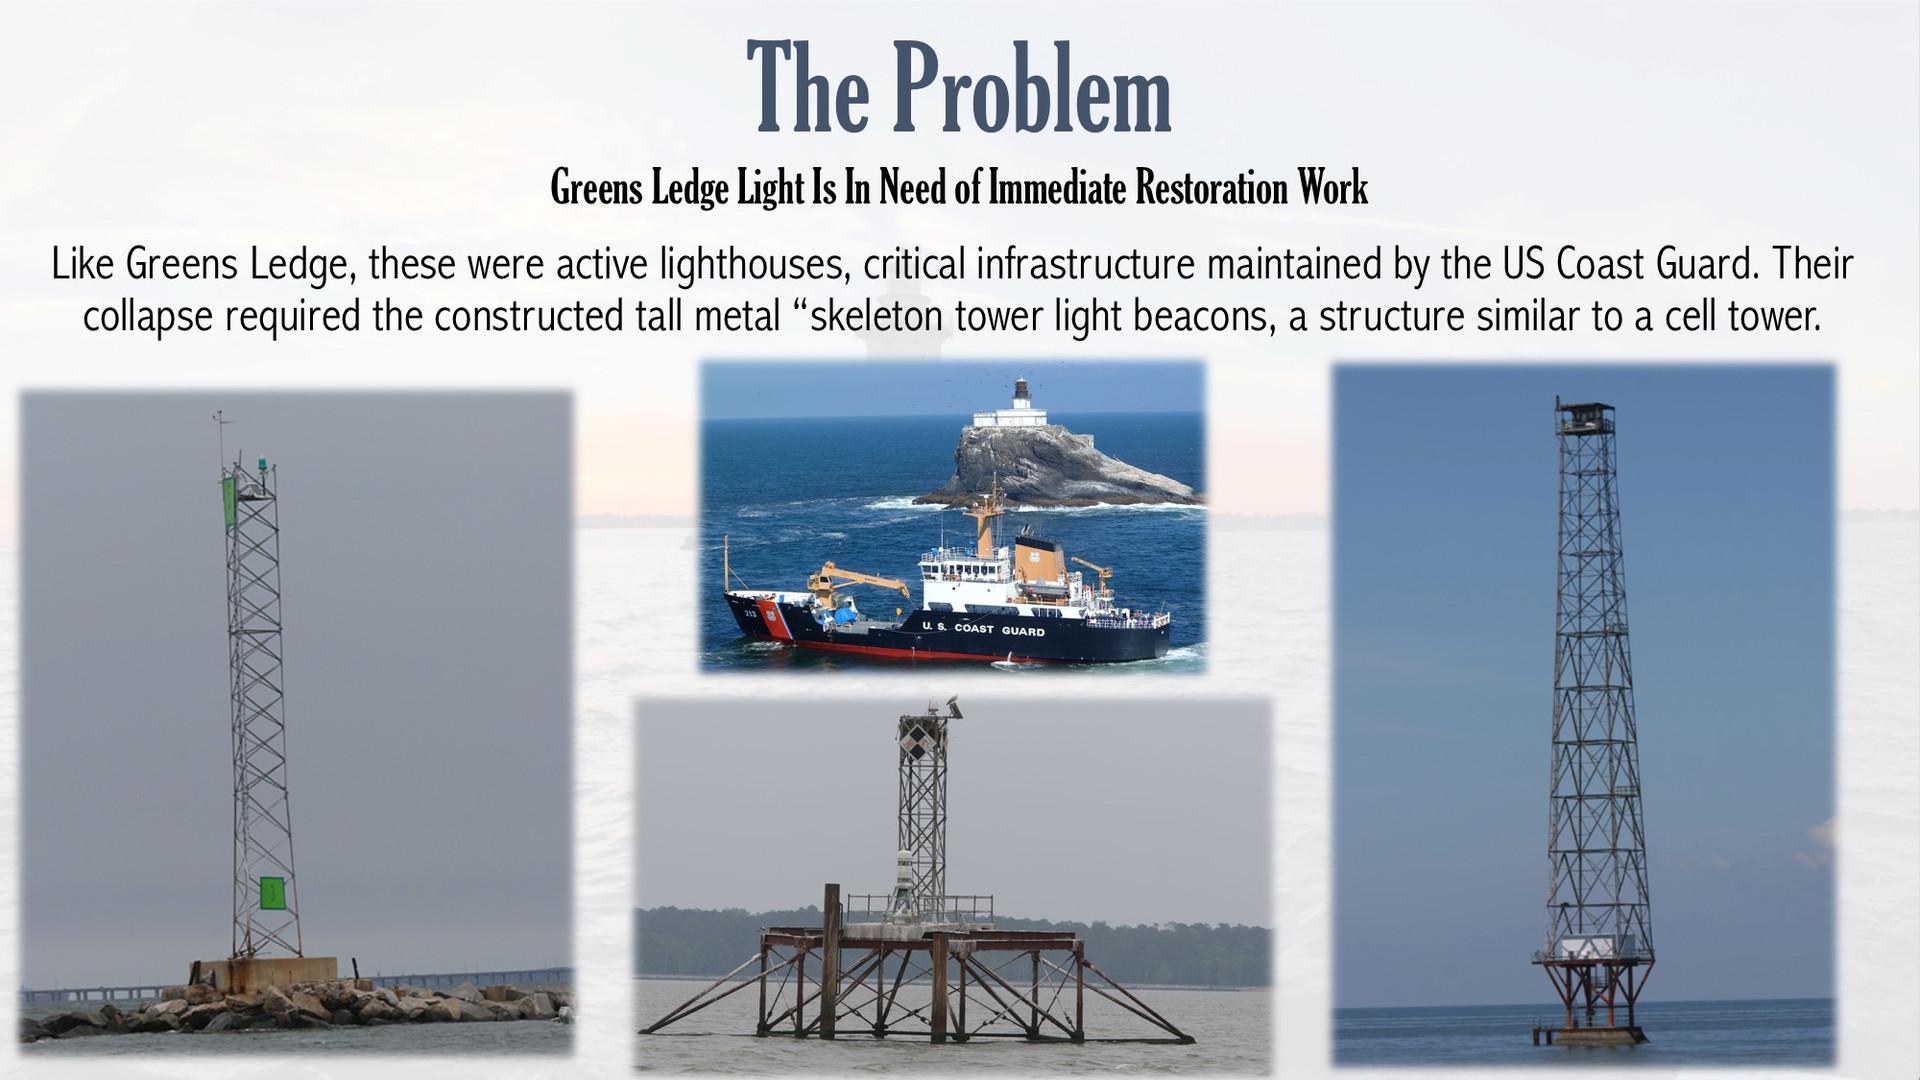 Greens Ledge Lighthouse